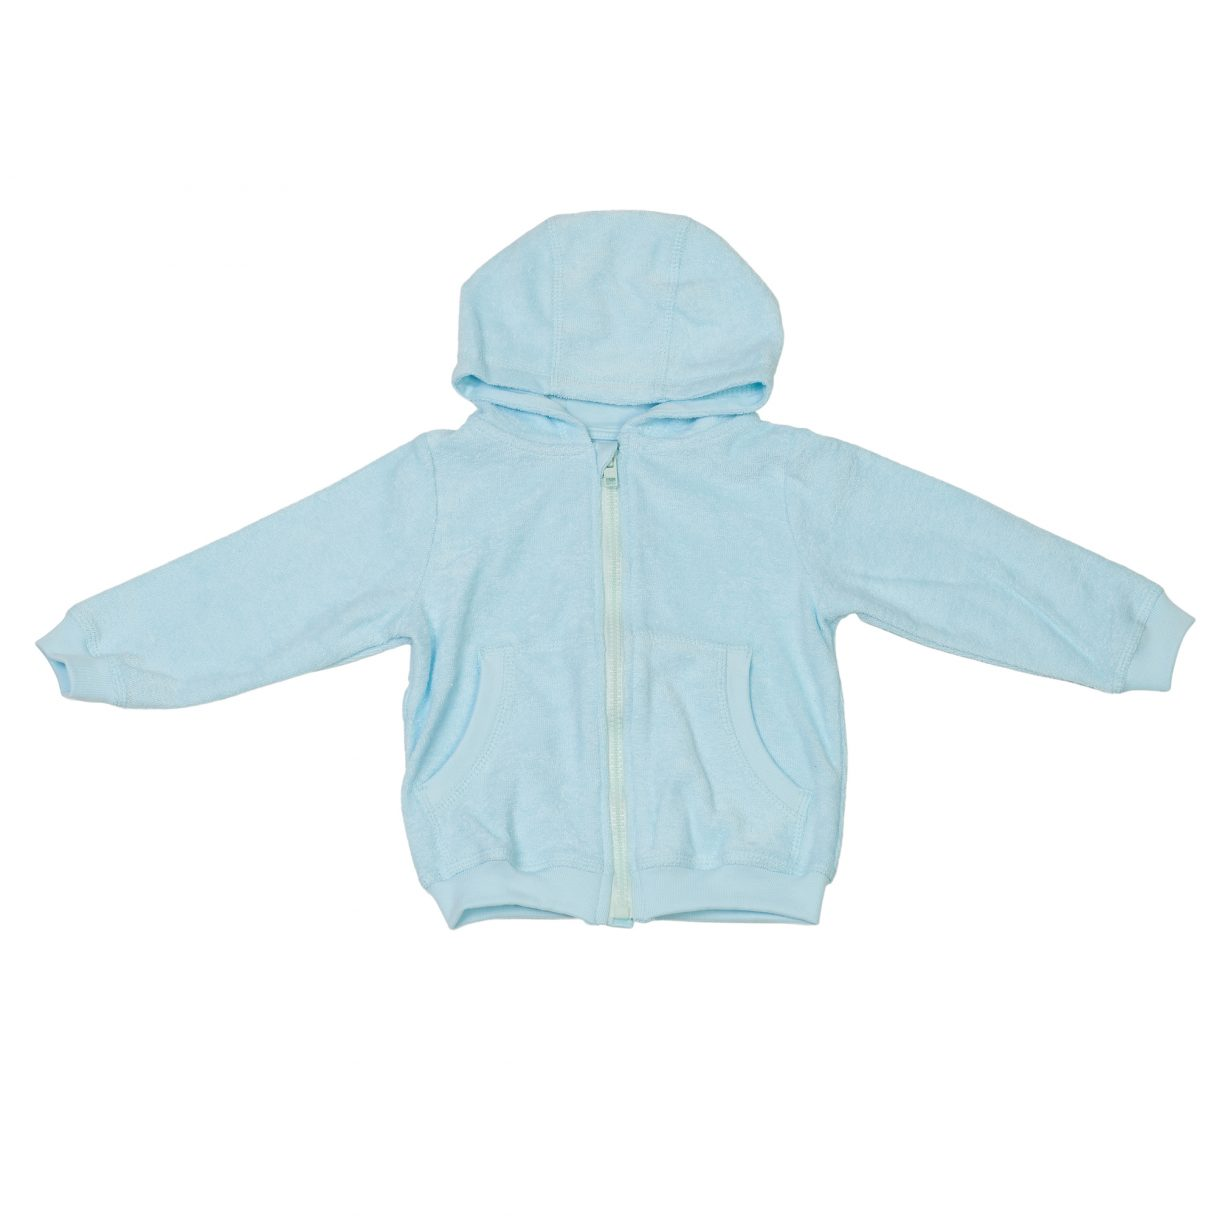 Baby Hooded Jacket Turquoise